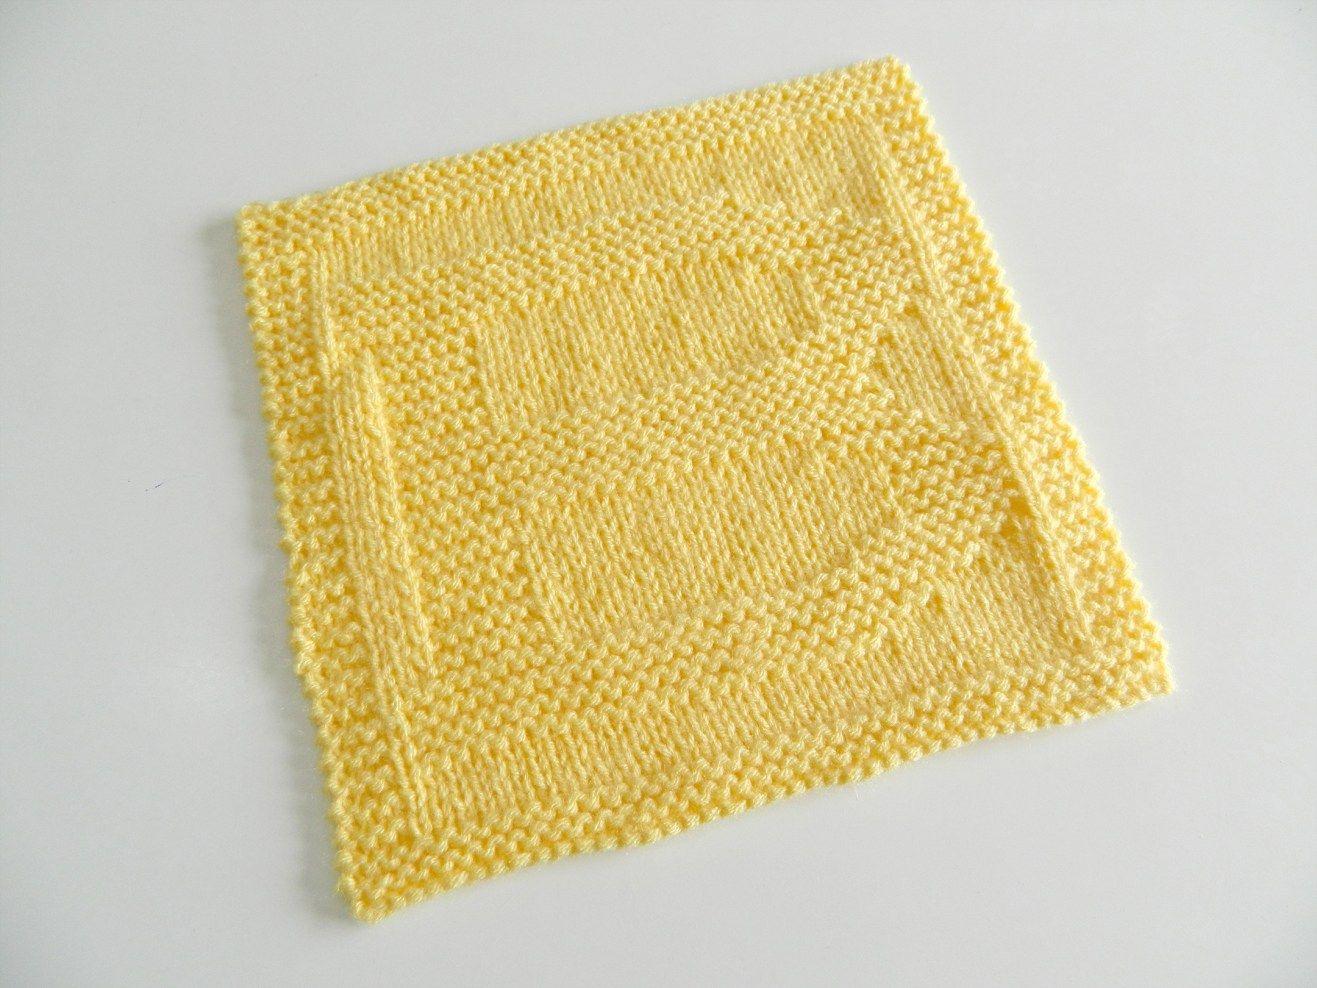 B dishcloth pattern alphabet dishcloth knitting pattern ...